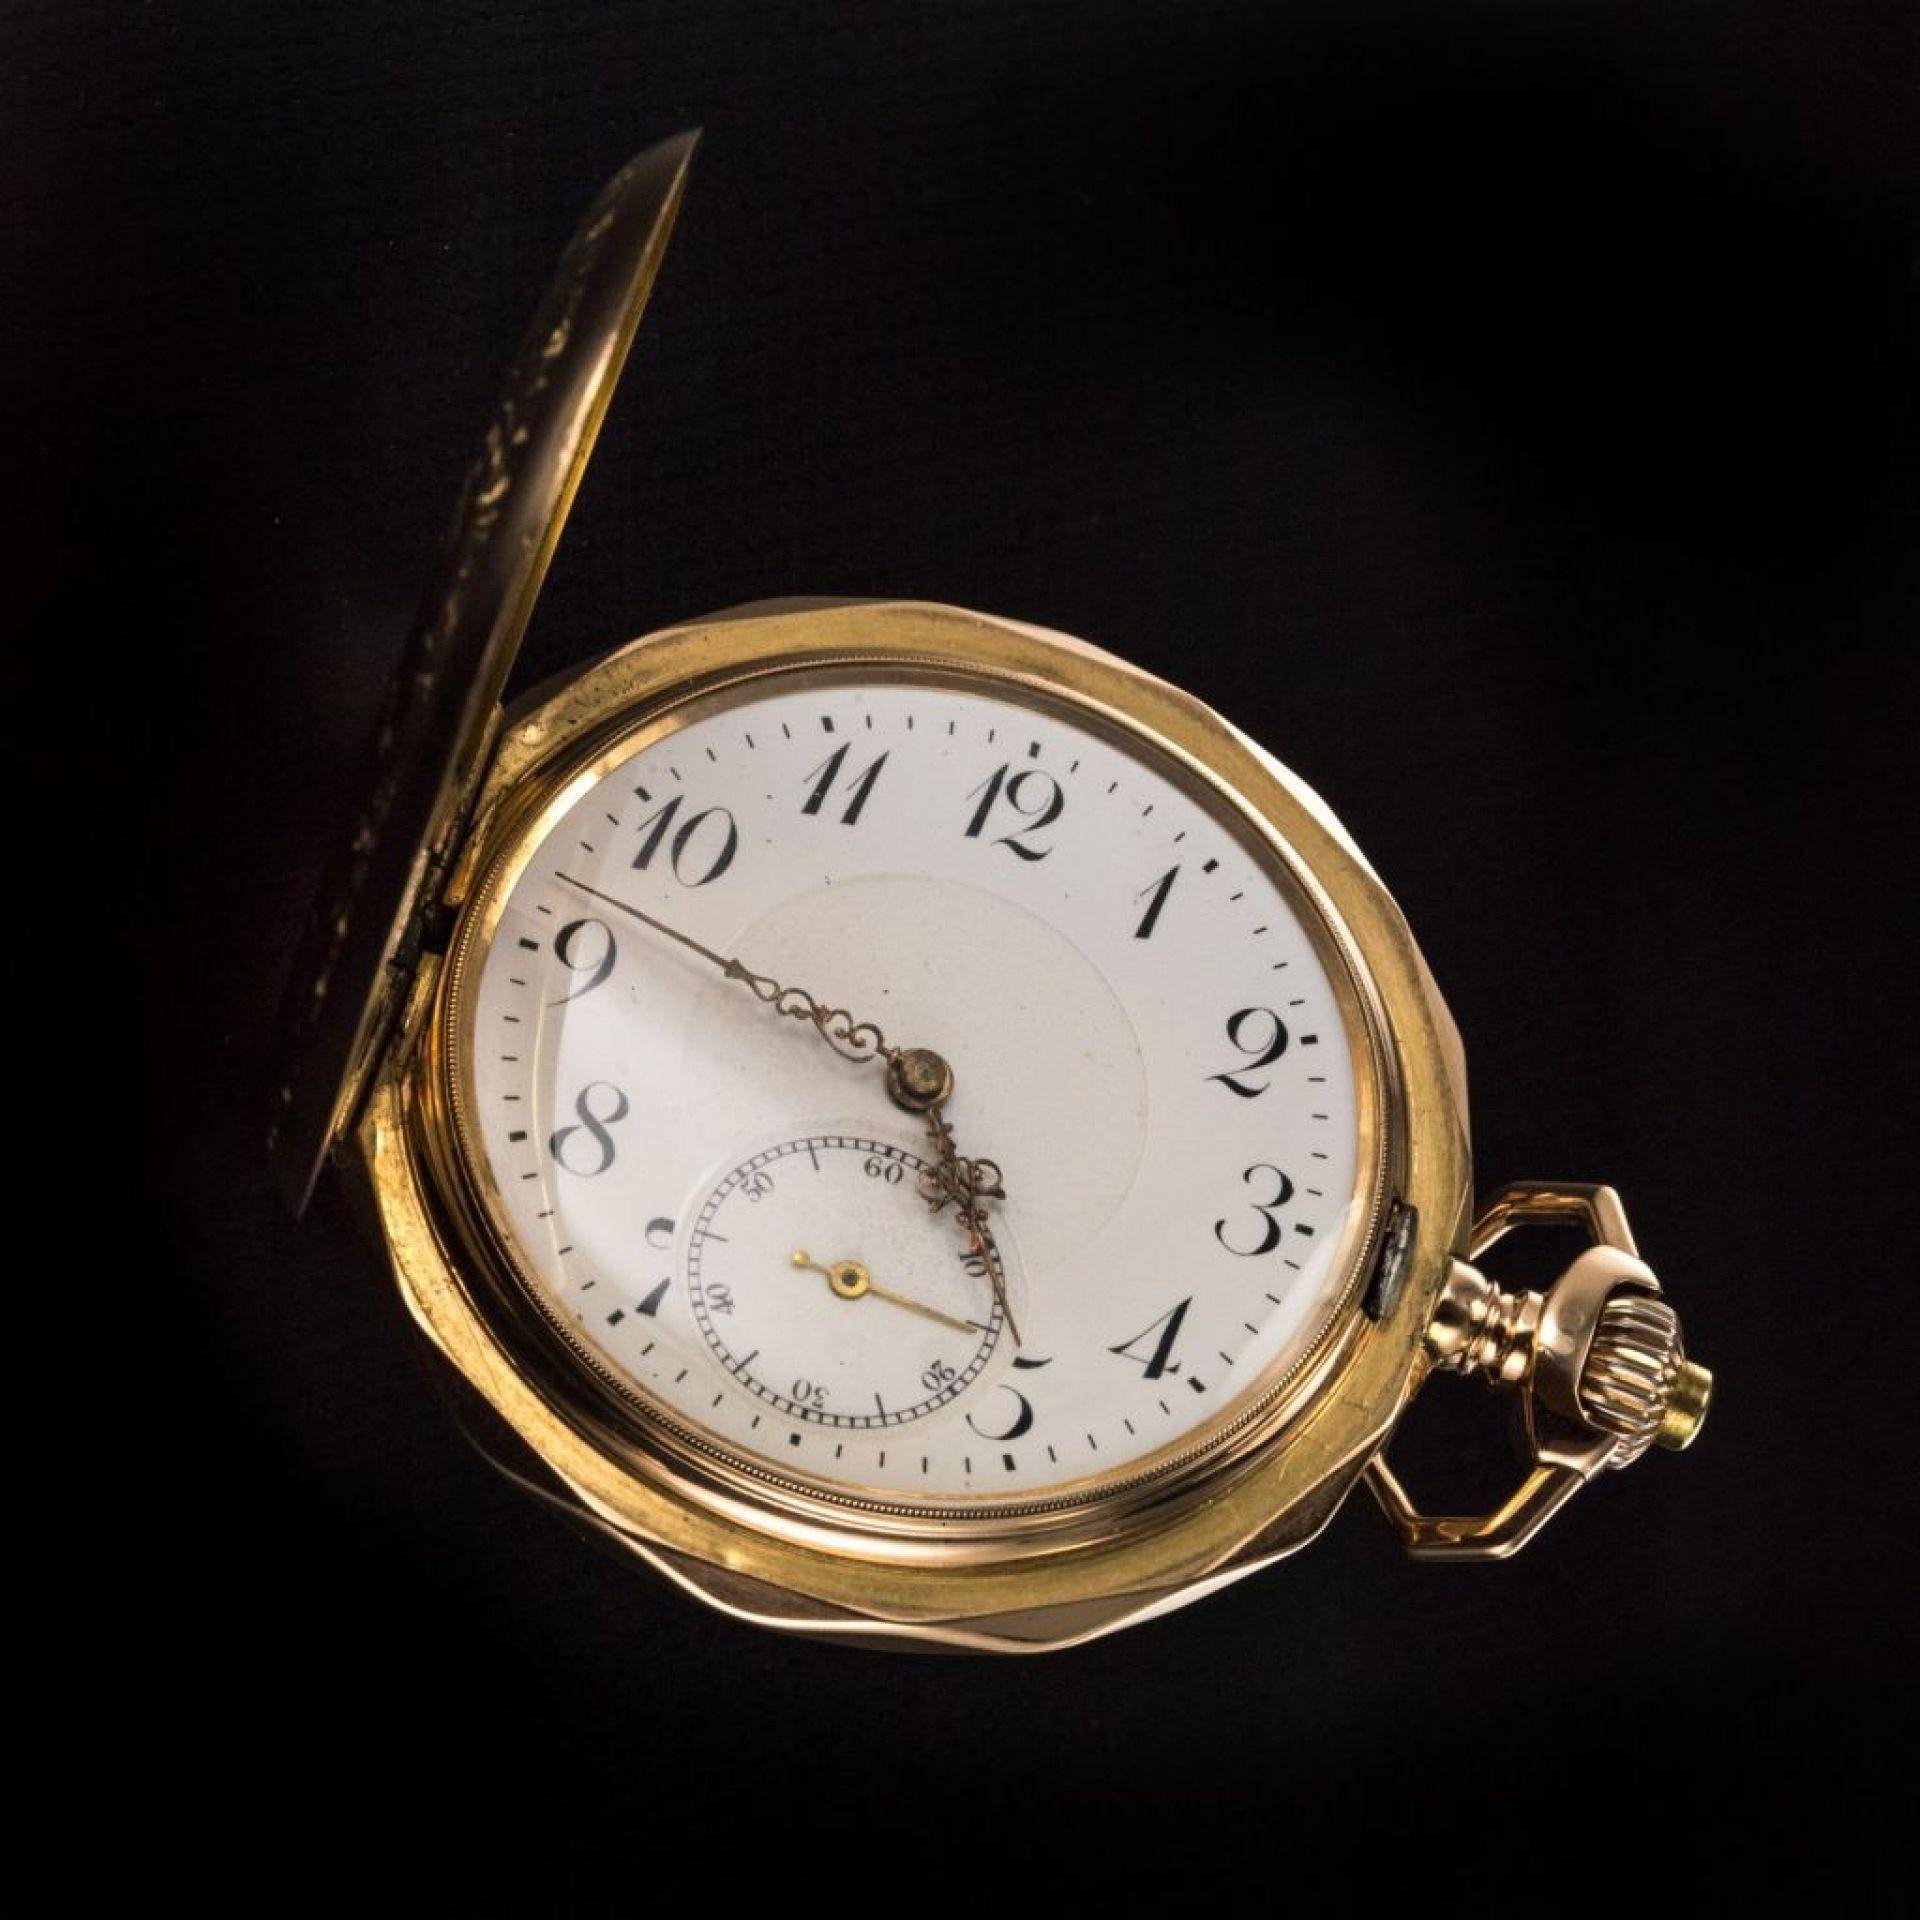 Breguet Machenery pocket watch in engraved pink gold